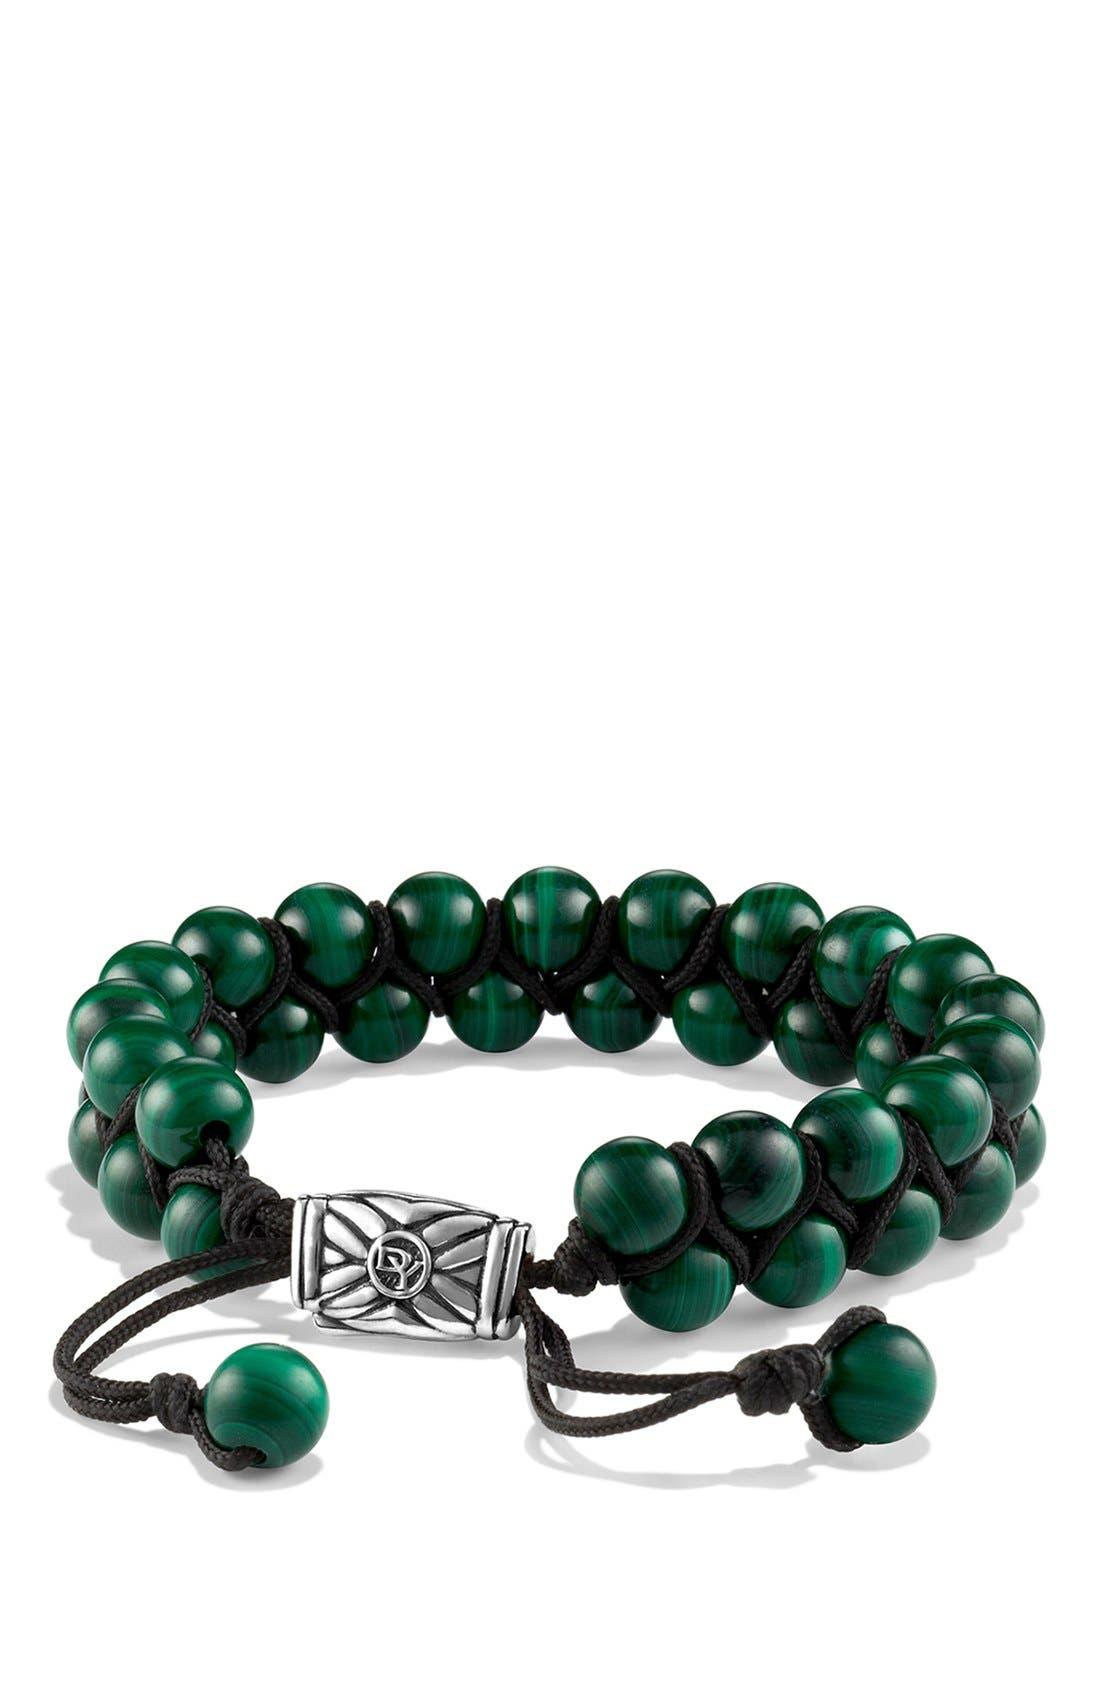 Alternate Image 1 Selected - David Yurman 'Spiritual Beads' Two-Row Bracelet with Malachite